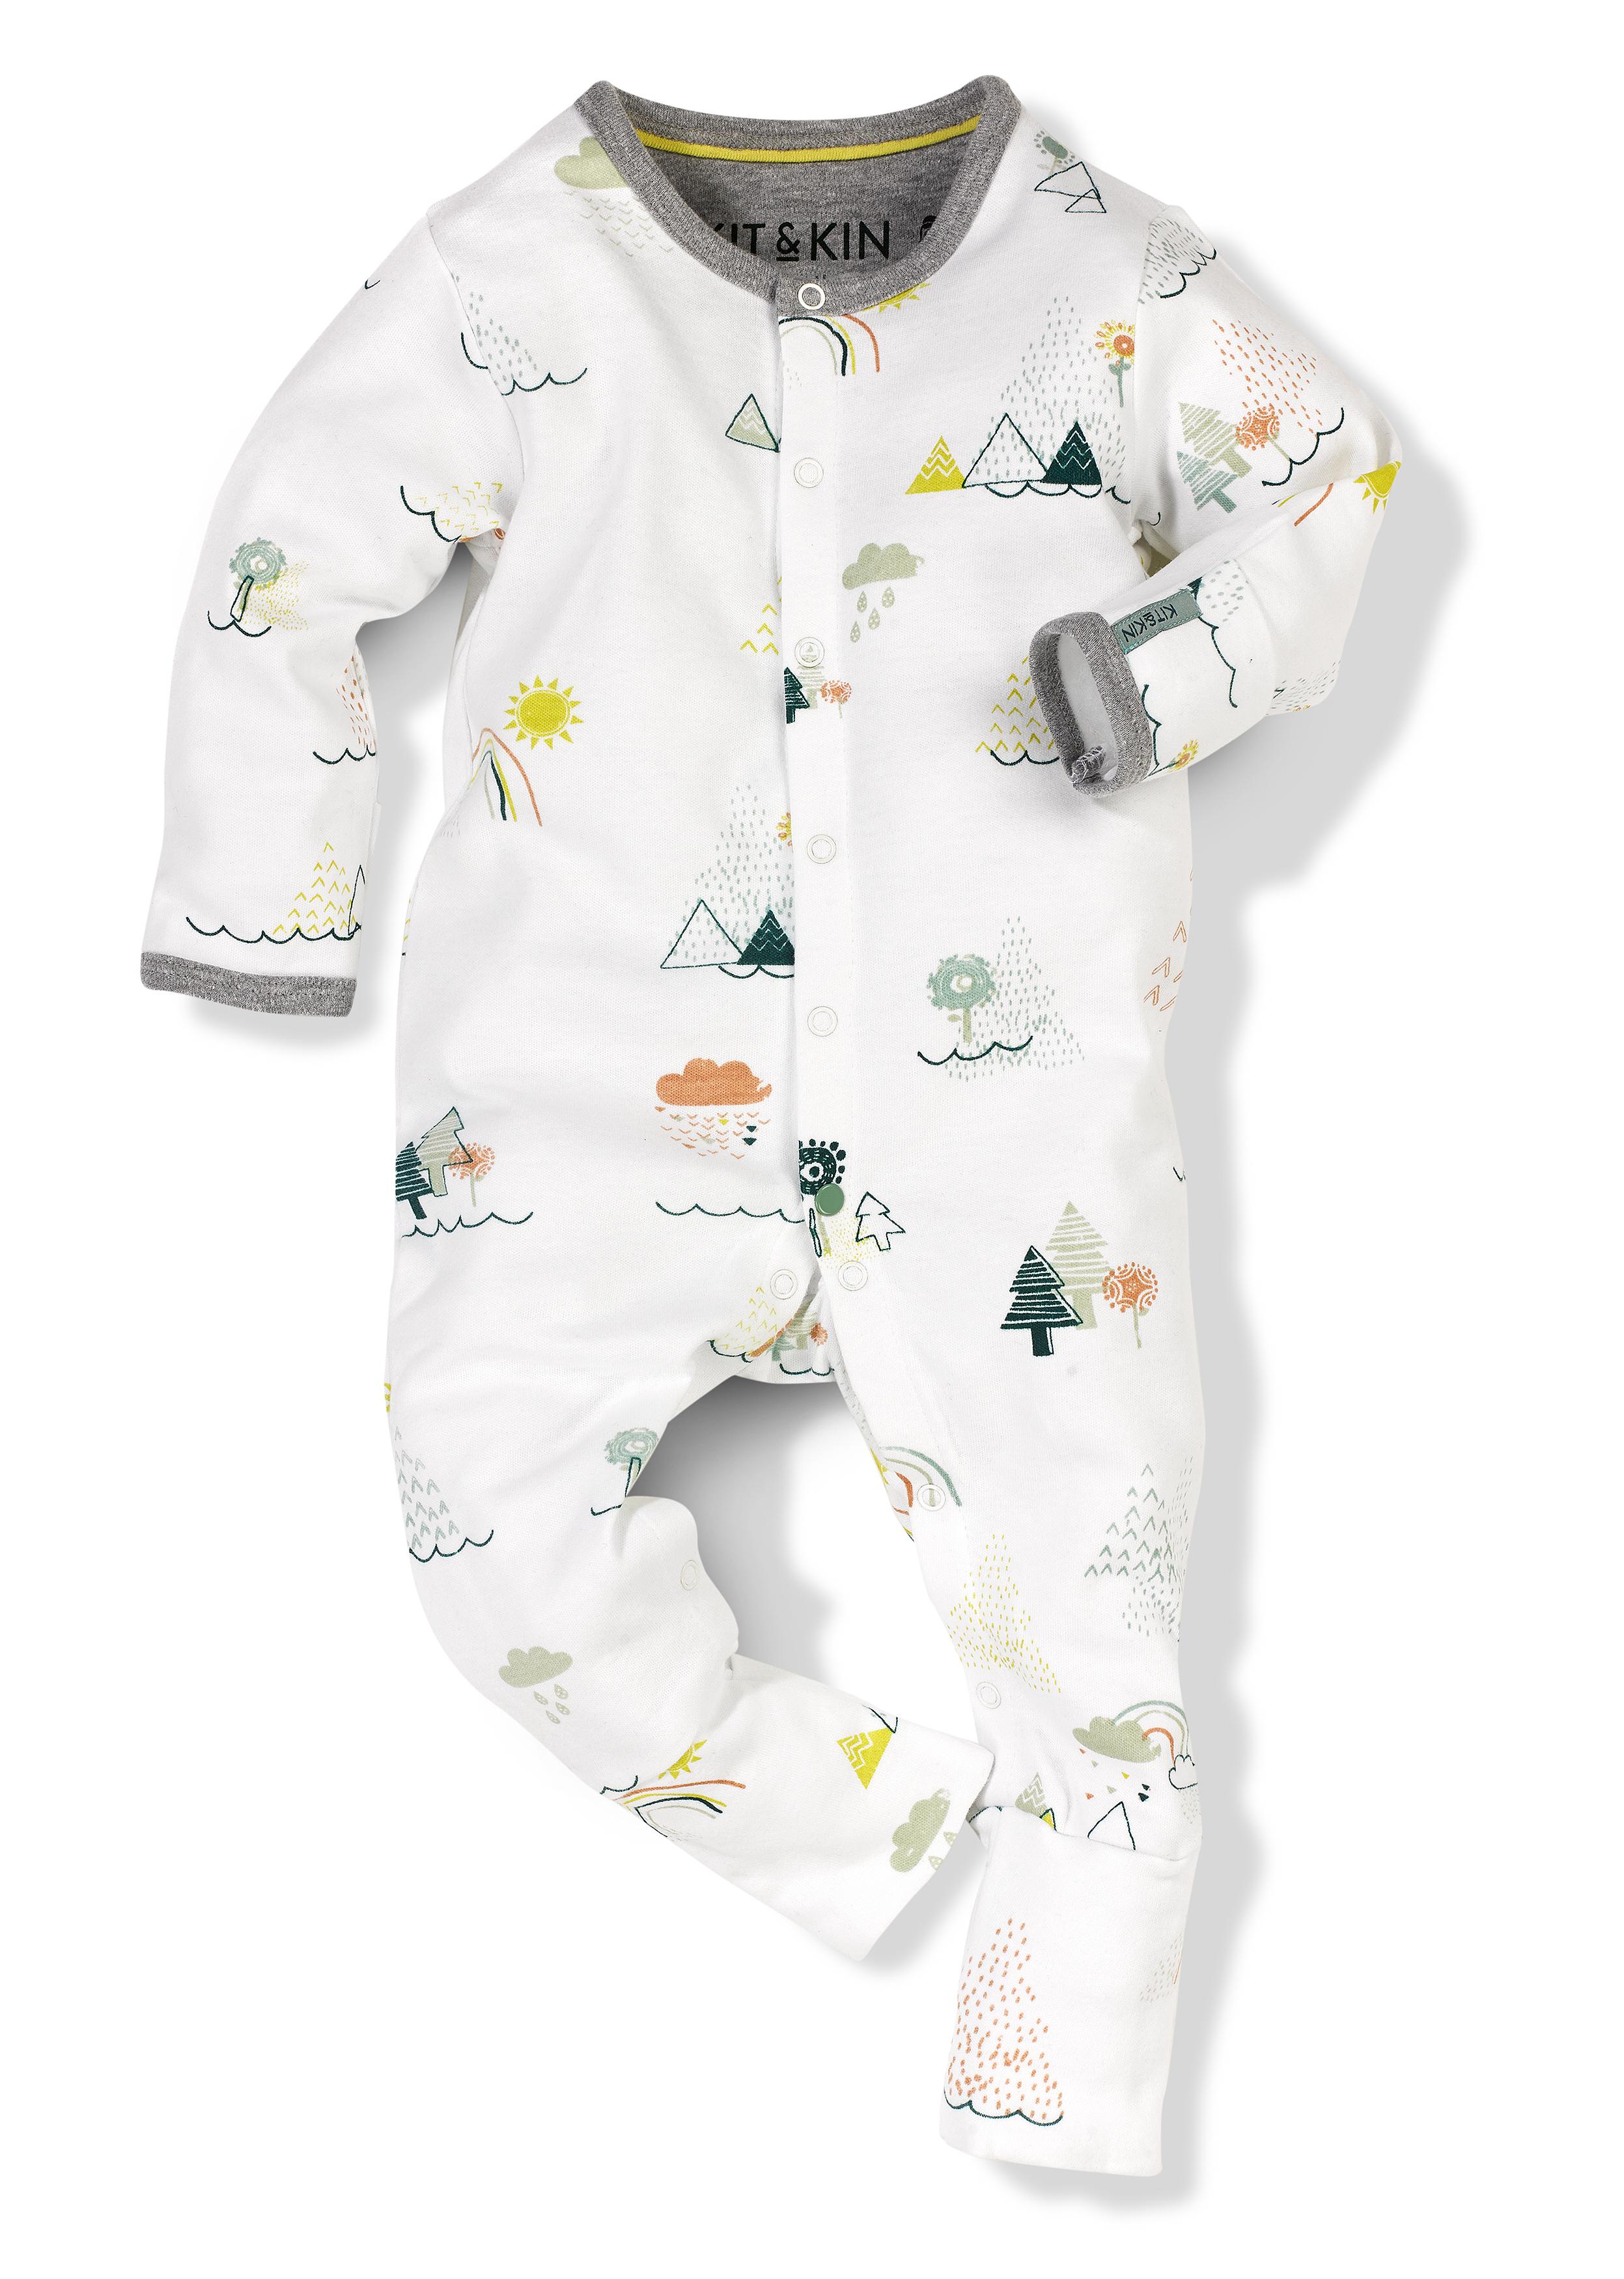 kit&kin,環保,辣妹合唱團艾瑪邦頓,有機棉,連身裝